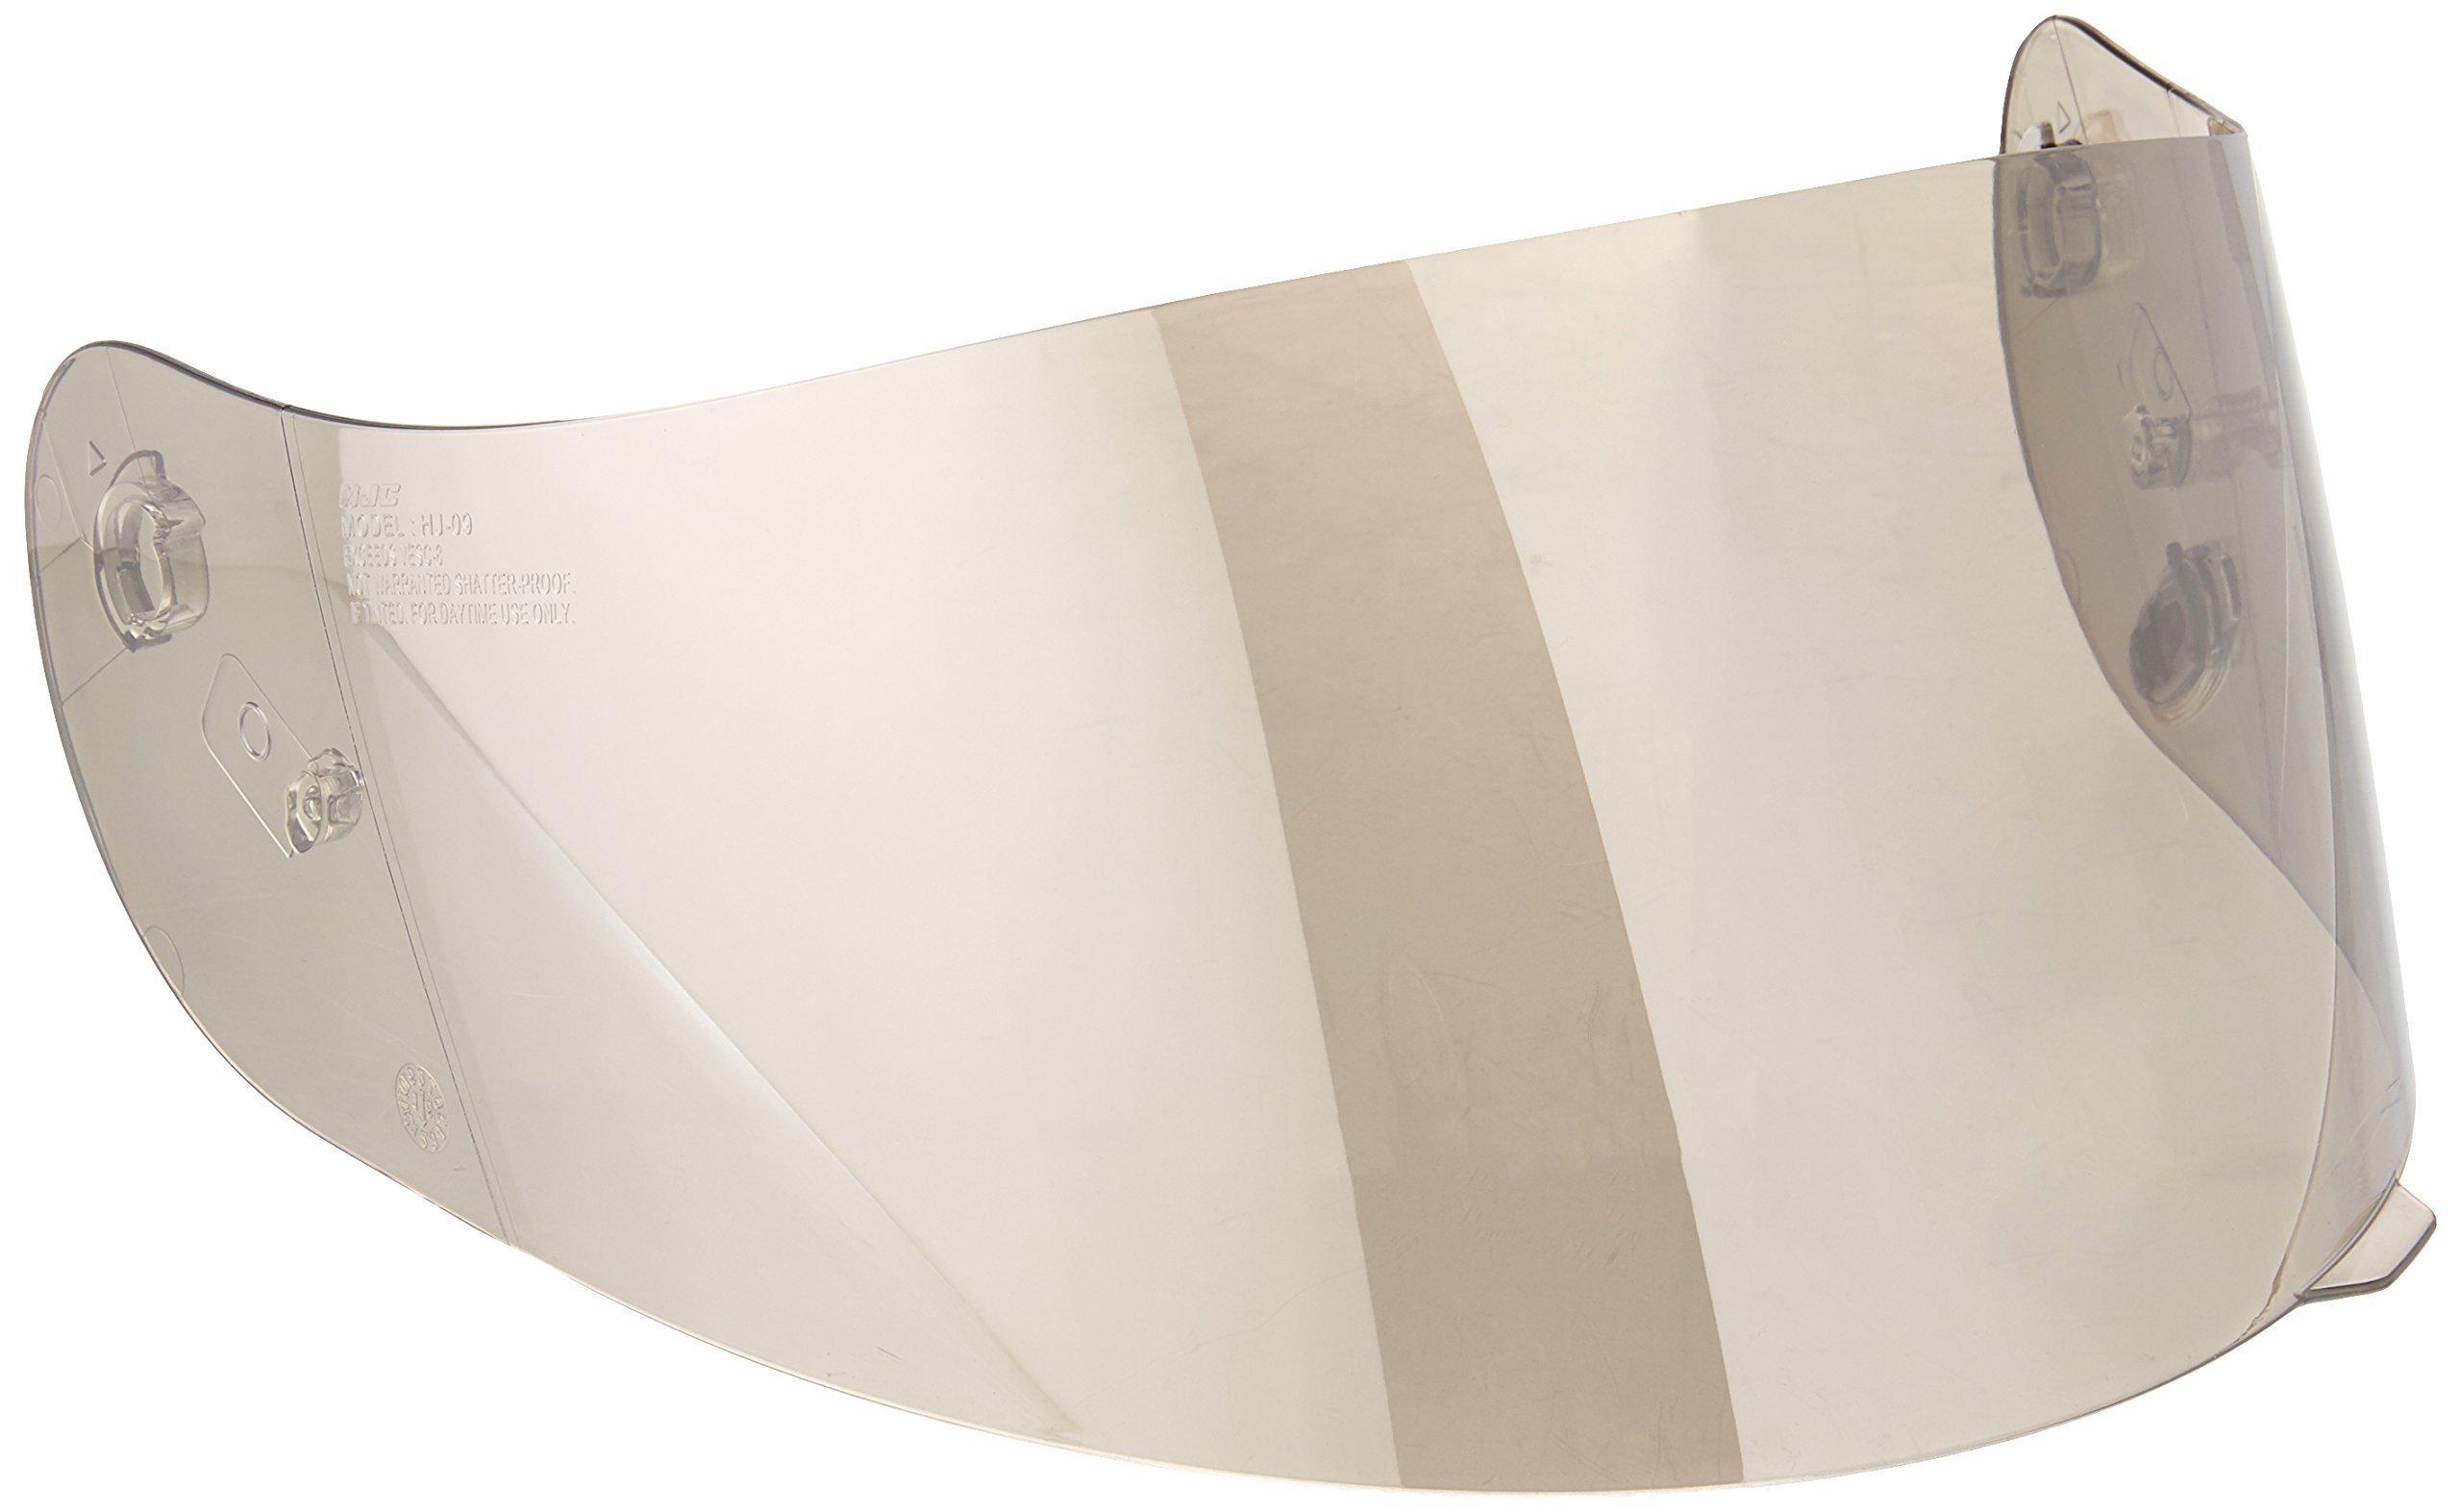 HJC Helmets HJ-09 Unisex-Adult Full-Face-Helmet-Style Replacement Helmet Face Shield (Silver,One Size)